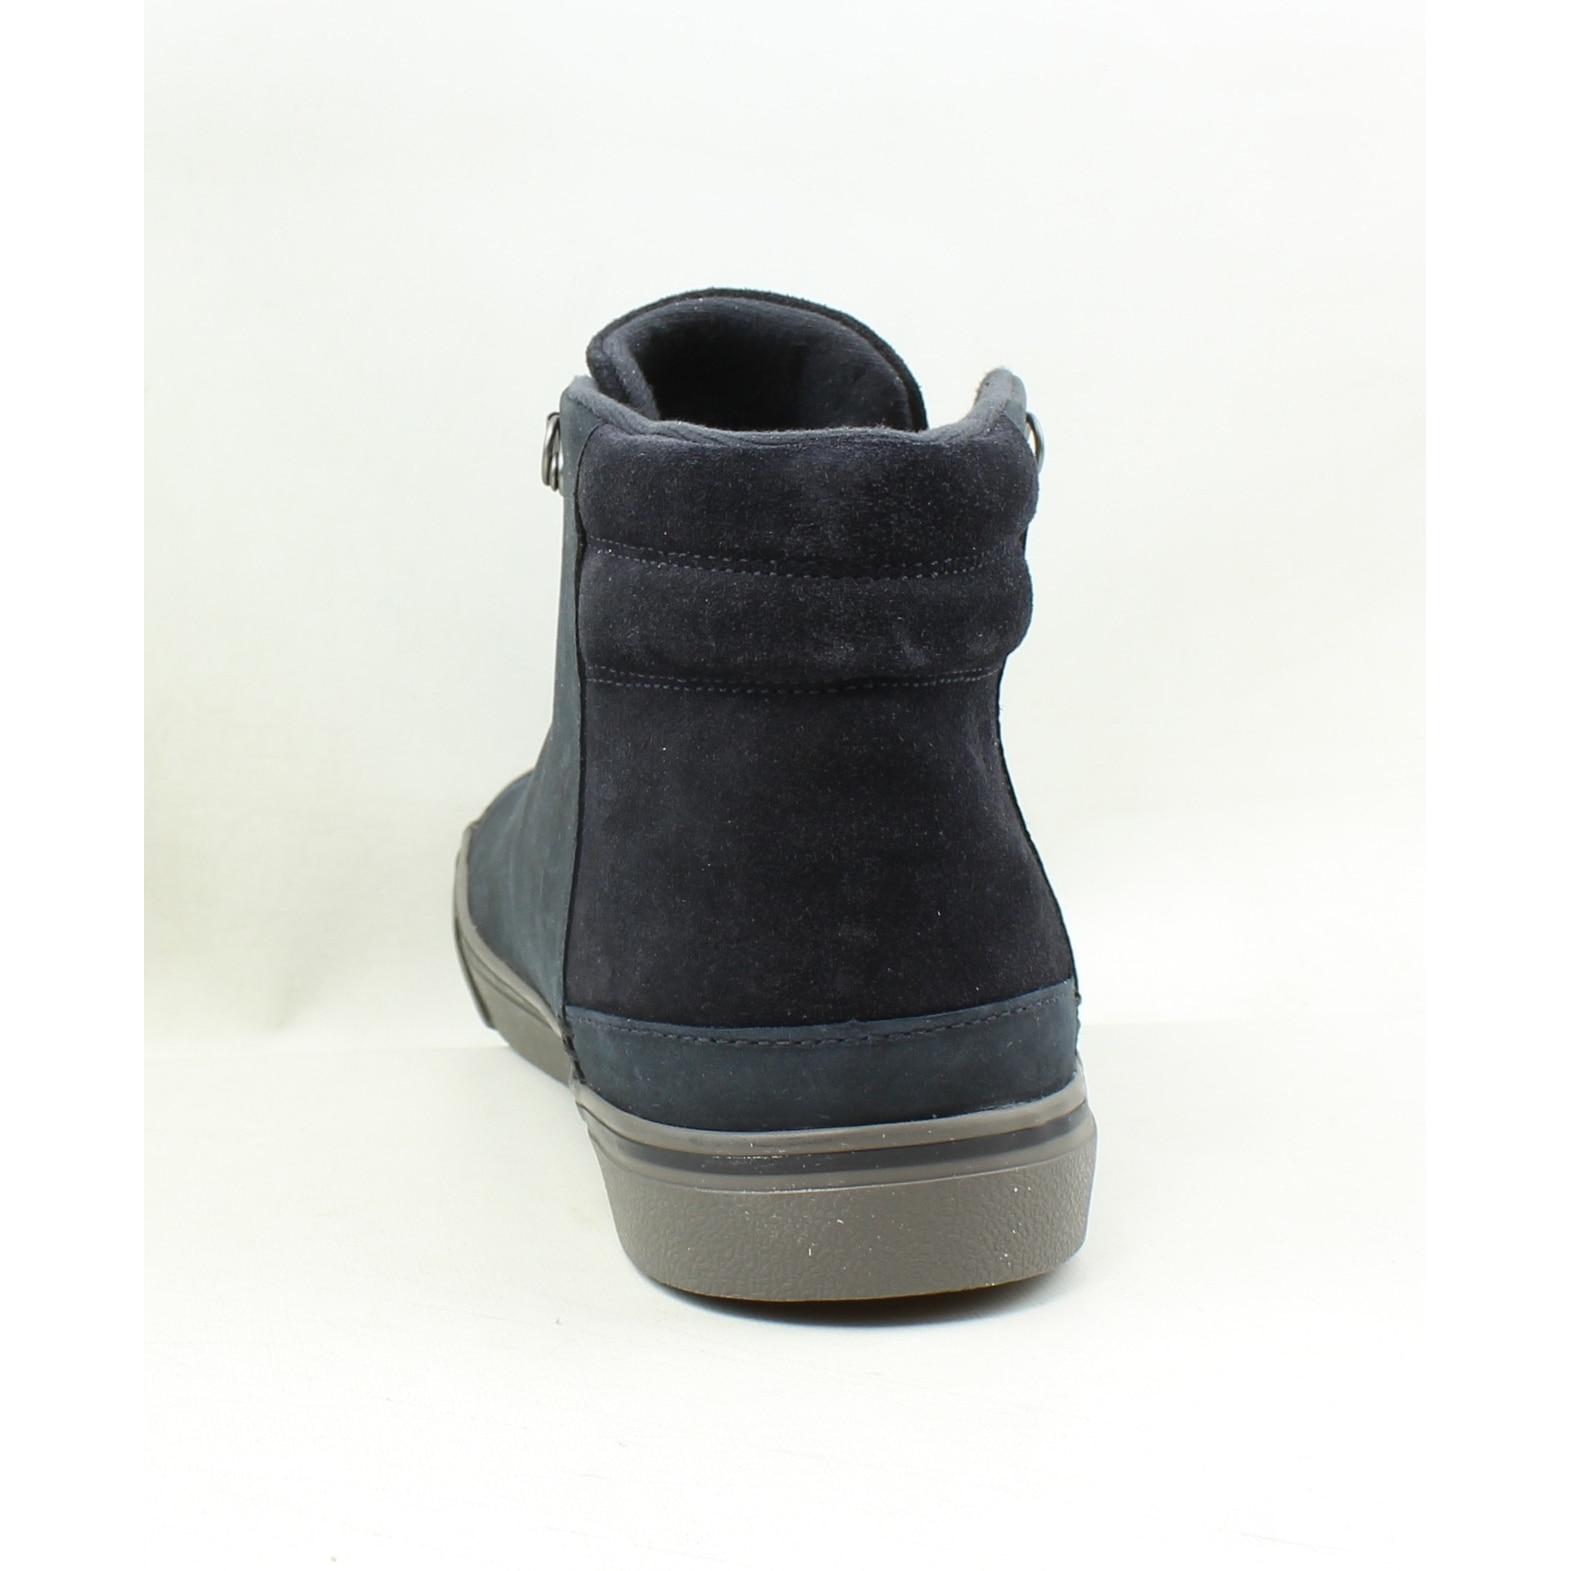 50cd89e4c8a UGG Mens Hoyt Ii True Navy Fashion Sneaker Size 10.5